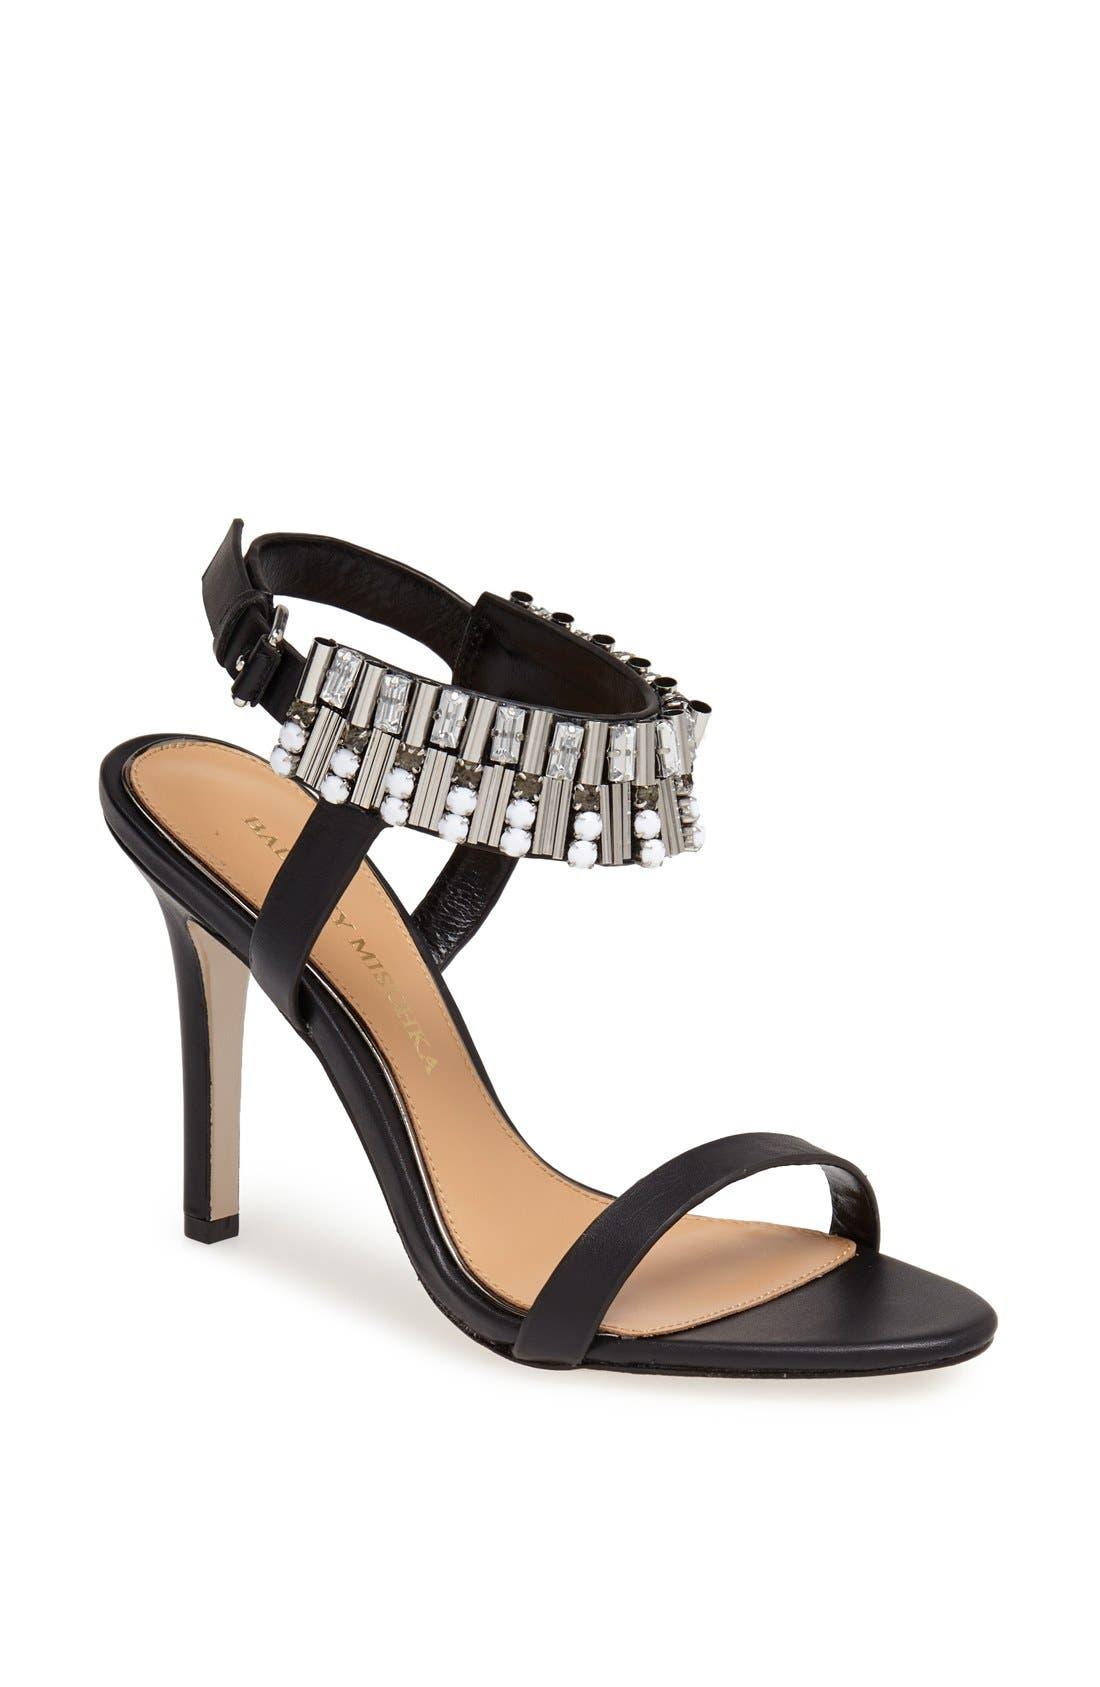 Main Image - Badgley Mischka 'Kallan' Crystal Cuff Leather Sandal